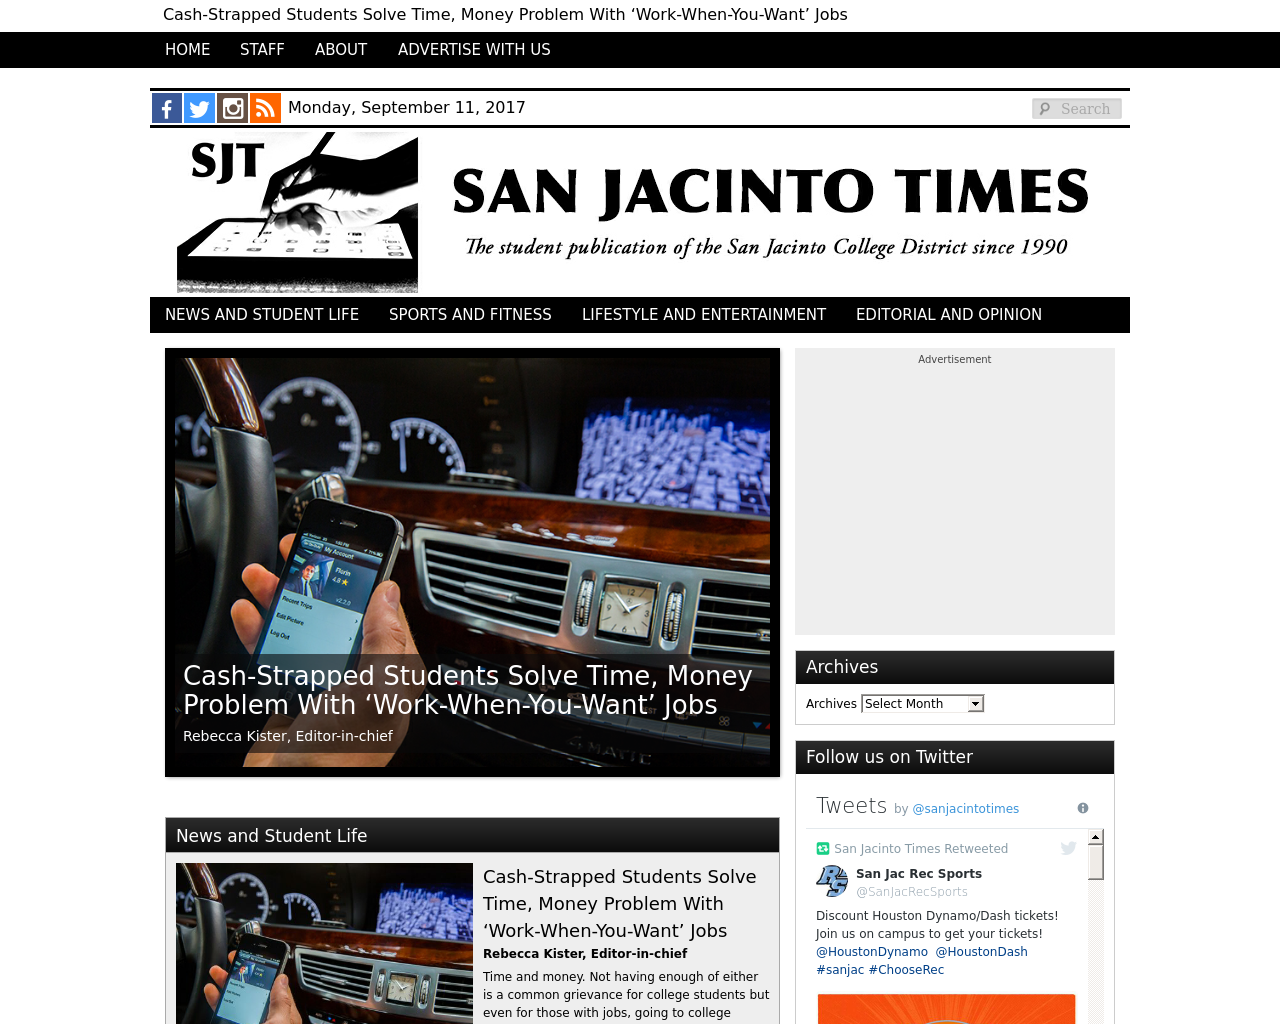 San-Jacinto-Times-Advertising-Reviews-Pricing